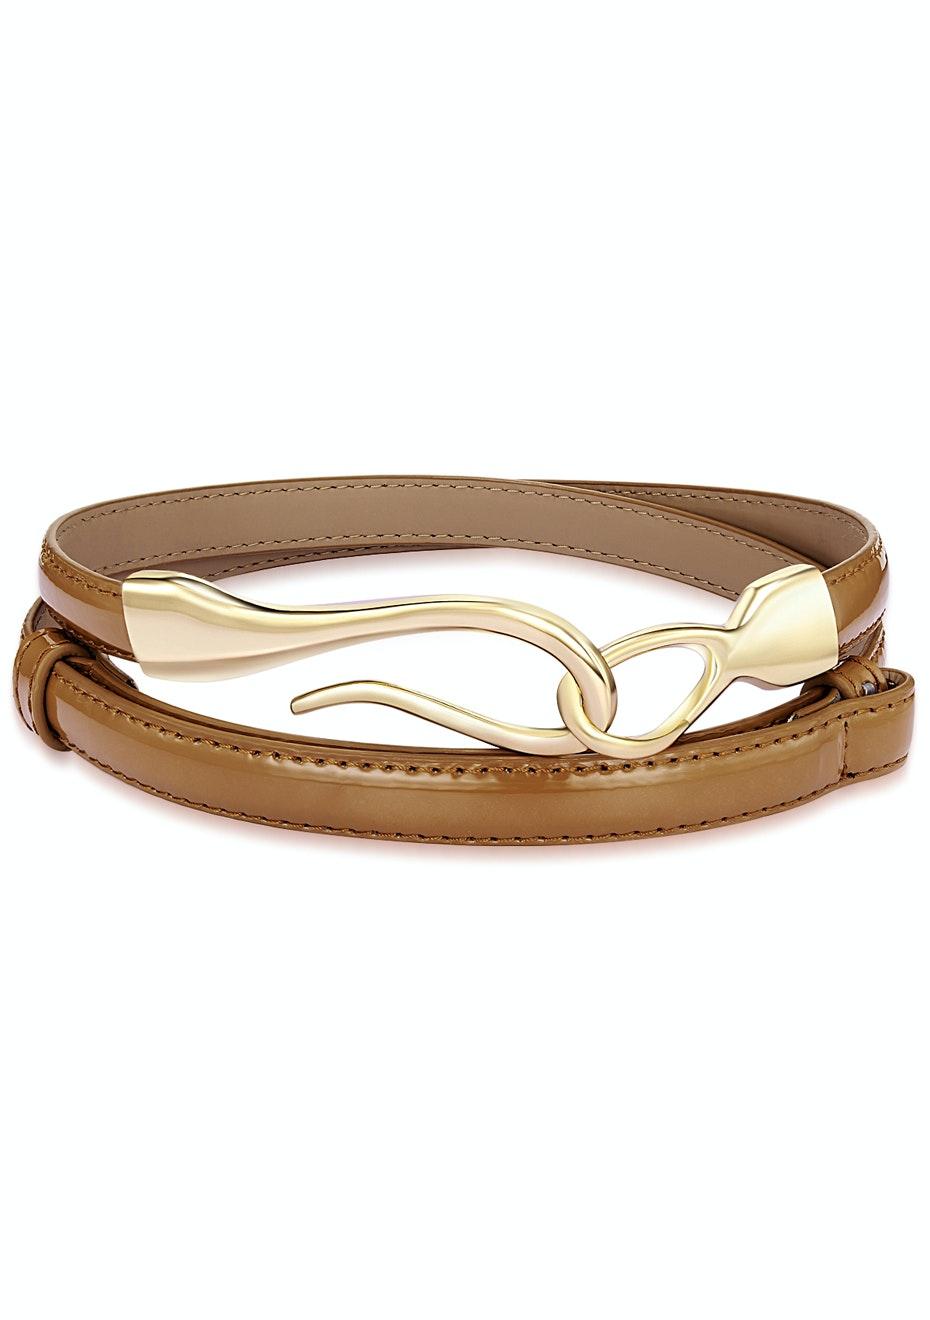 Genuine Cow Leather Skinny Waist Belt-Aurora brown